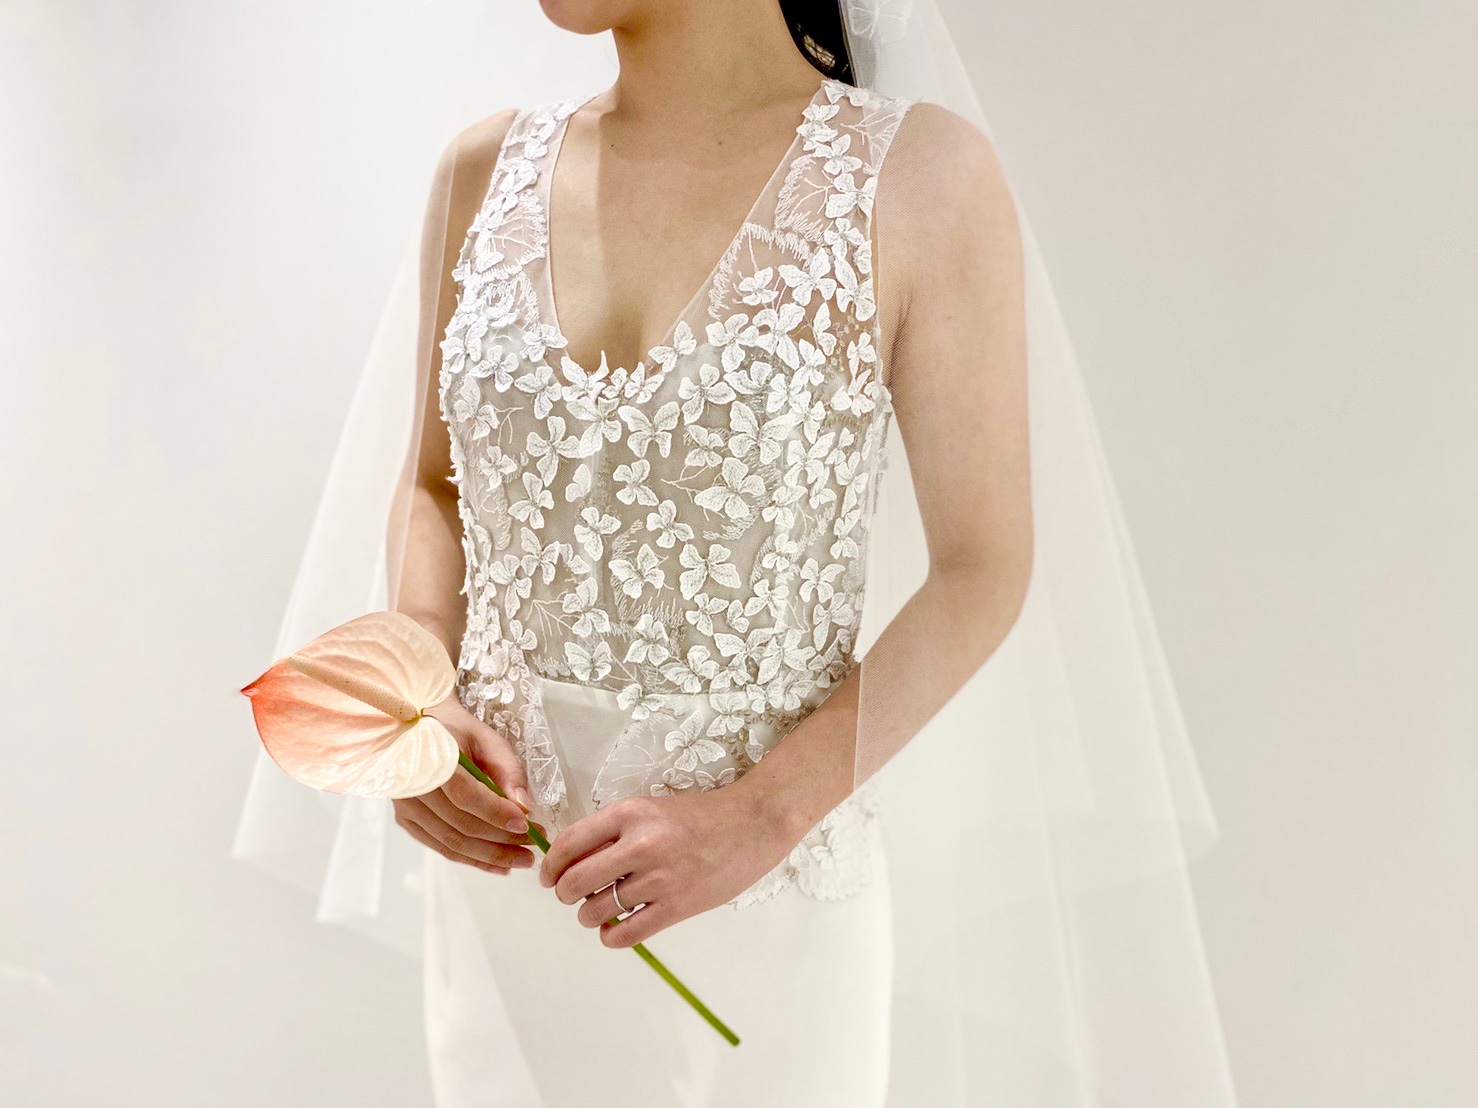 THE TREAT DRESSING大阪店からエリザベス・フィルモアのVネックのすっきりしたウェディングドレスと新作オリジナルベールと合わせた素敵なコーディネート